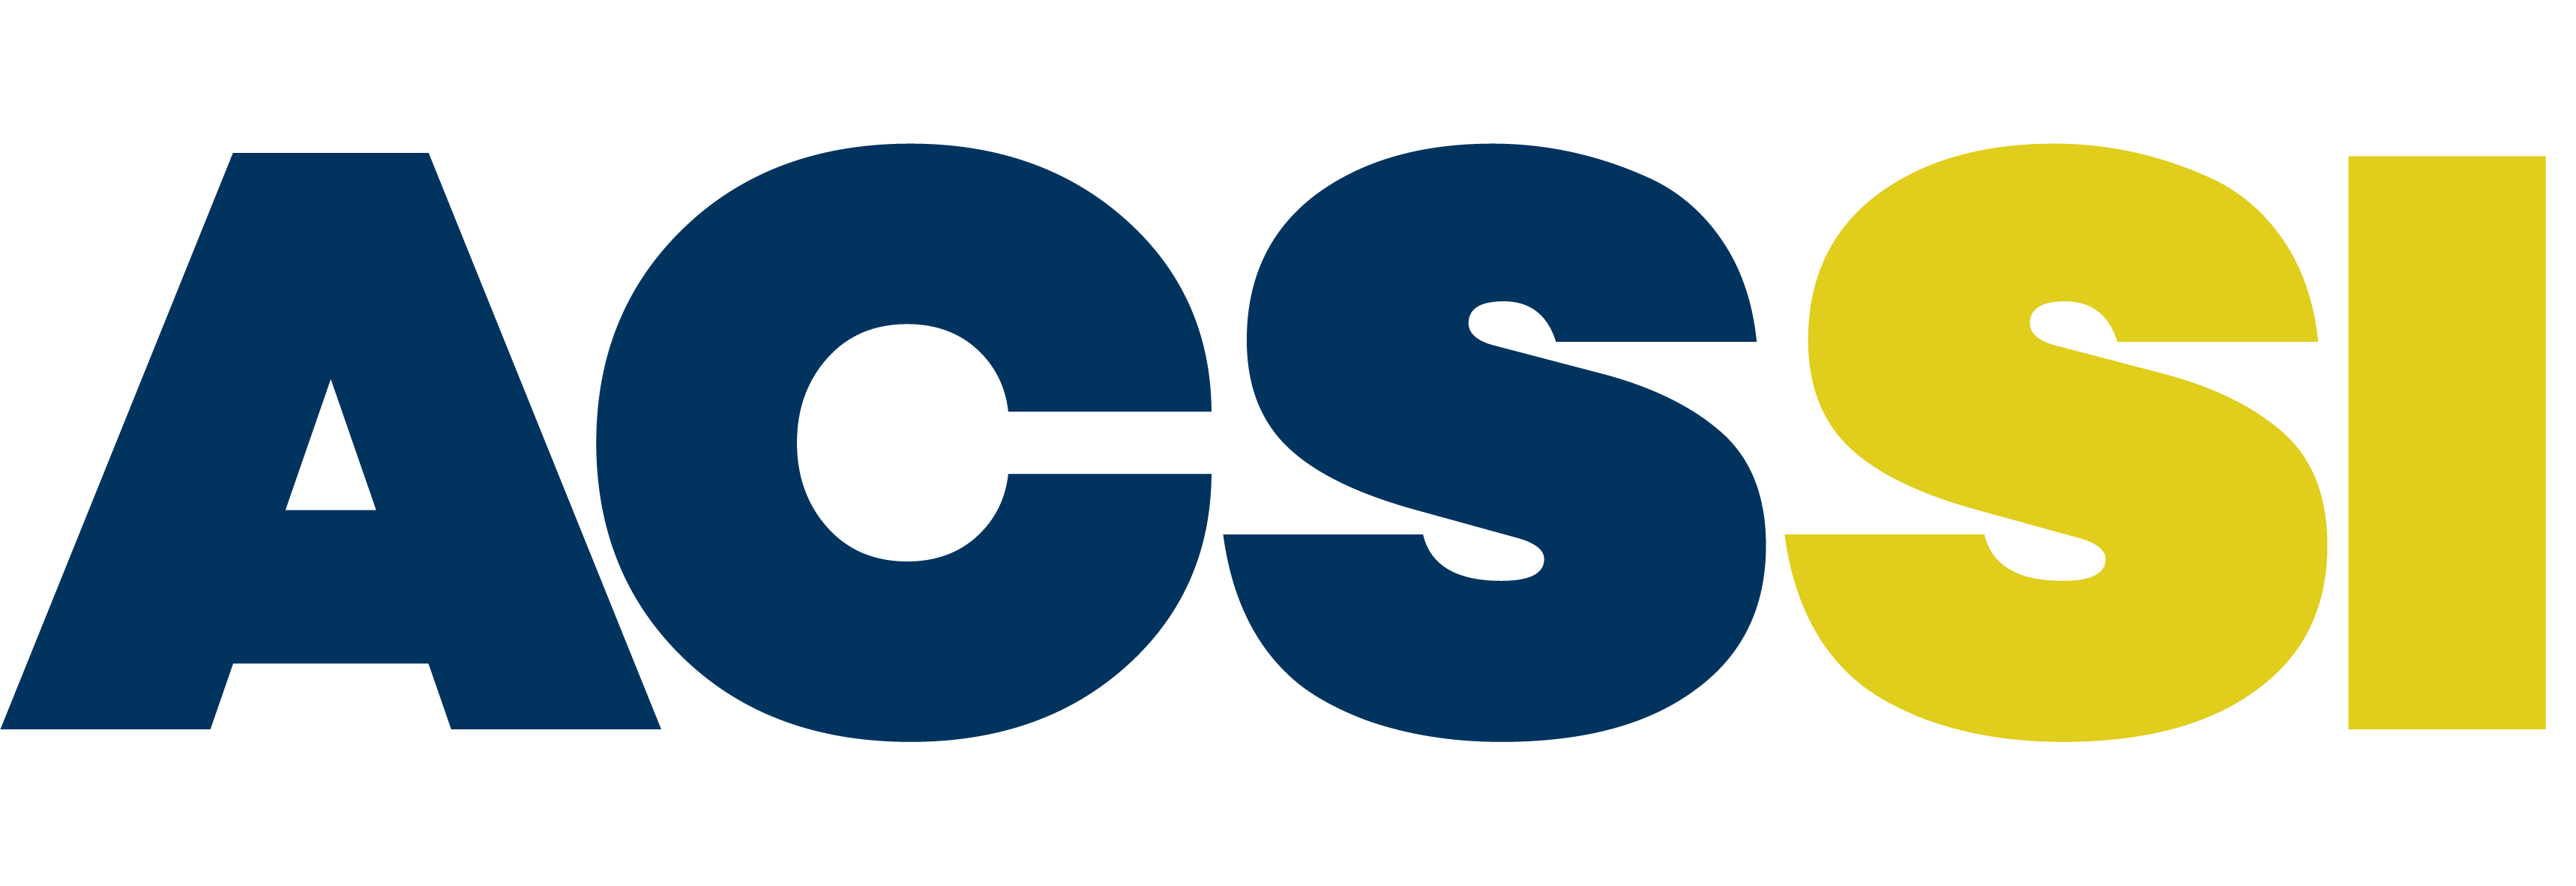 ACSSI